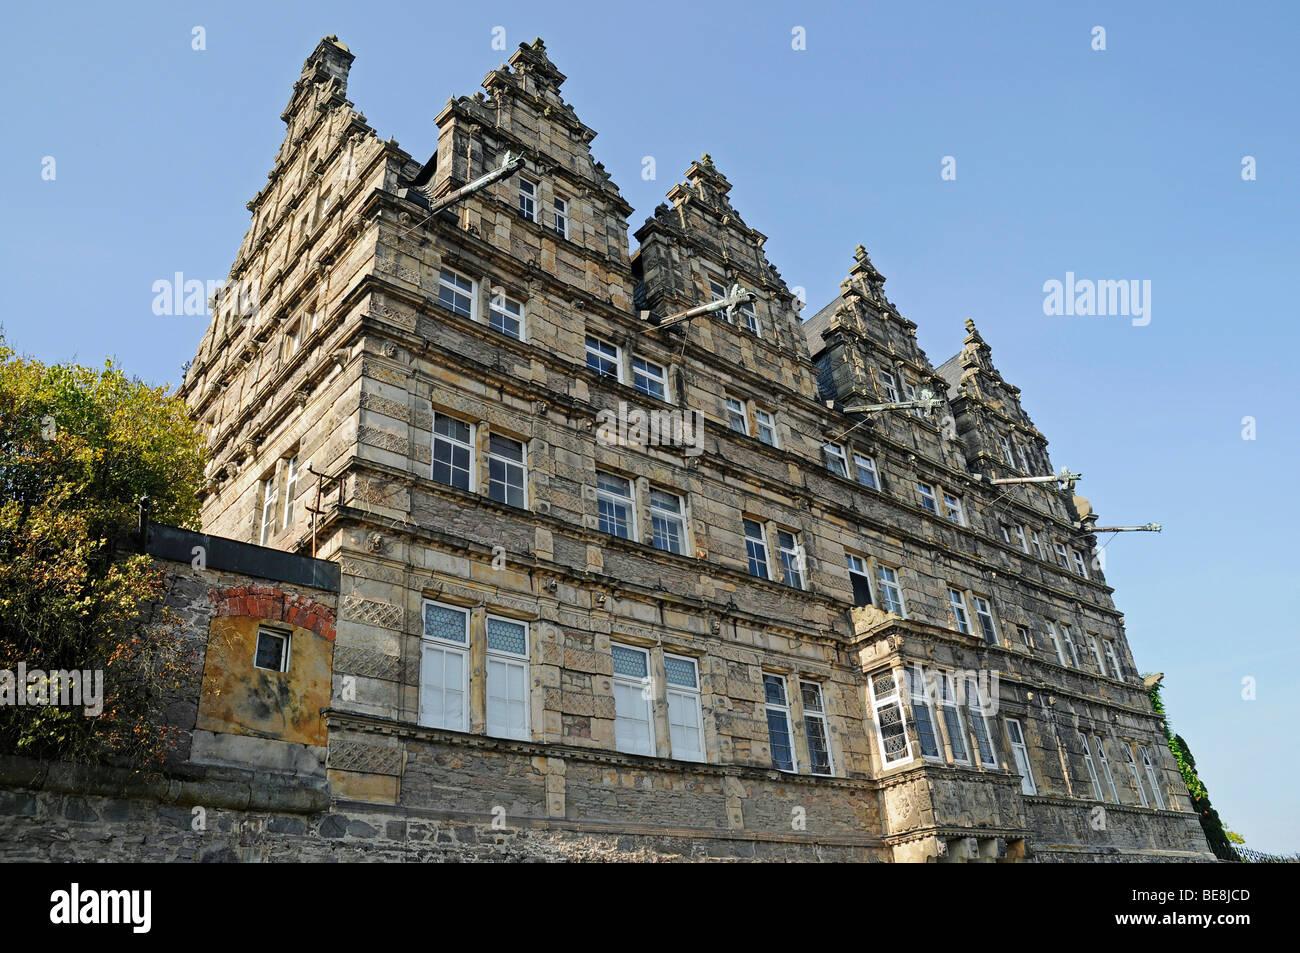 Haemelschenburg Castle, Weser Renaissance, Bad Pyrmont, Hameln, Emmerthal, Lower Saxony, Germany, Europe Stock Photo